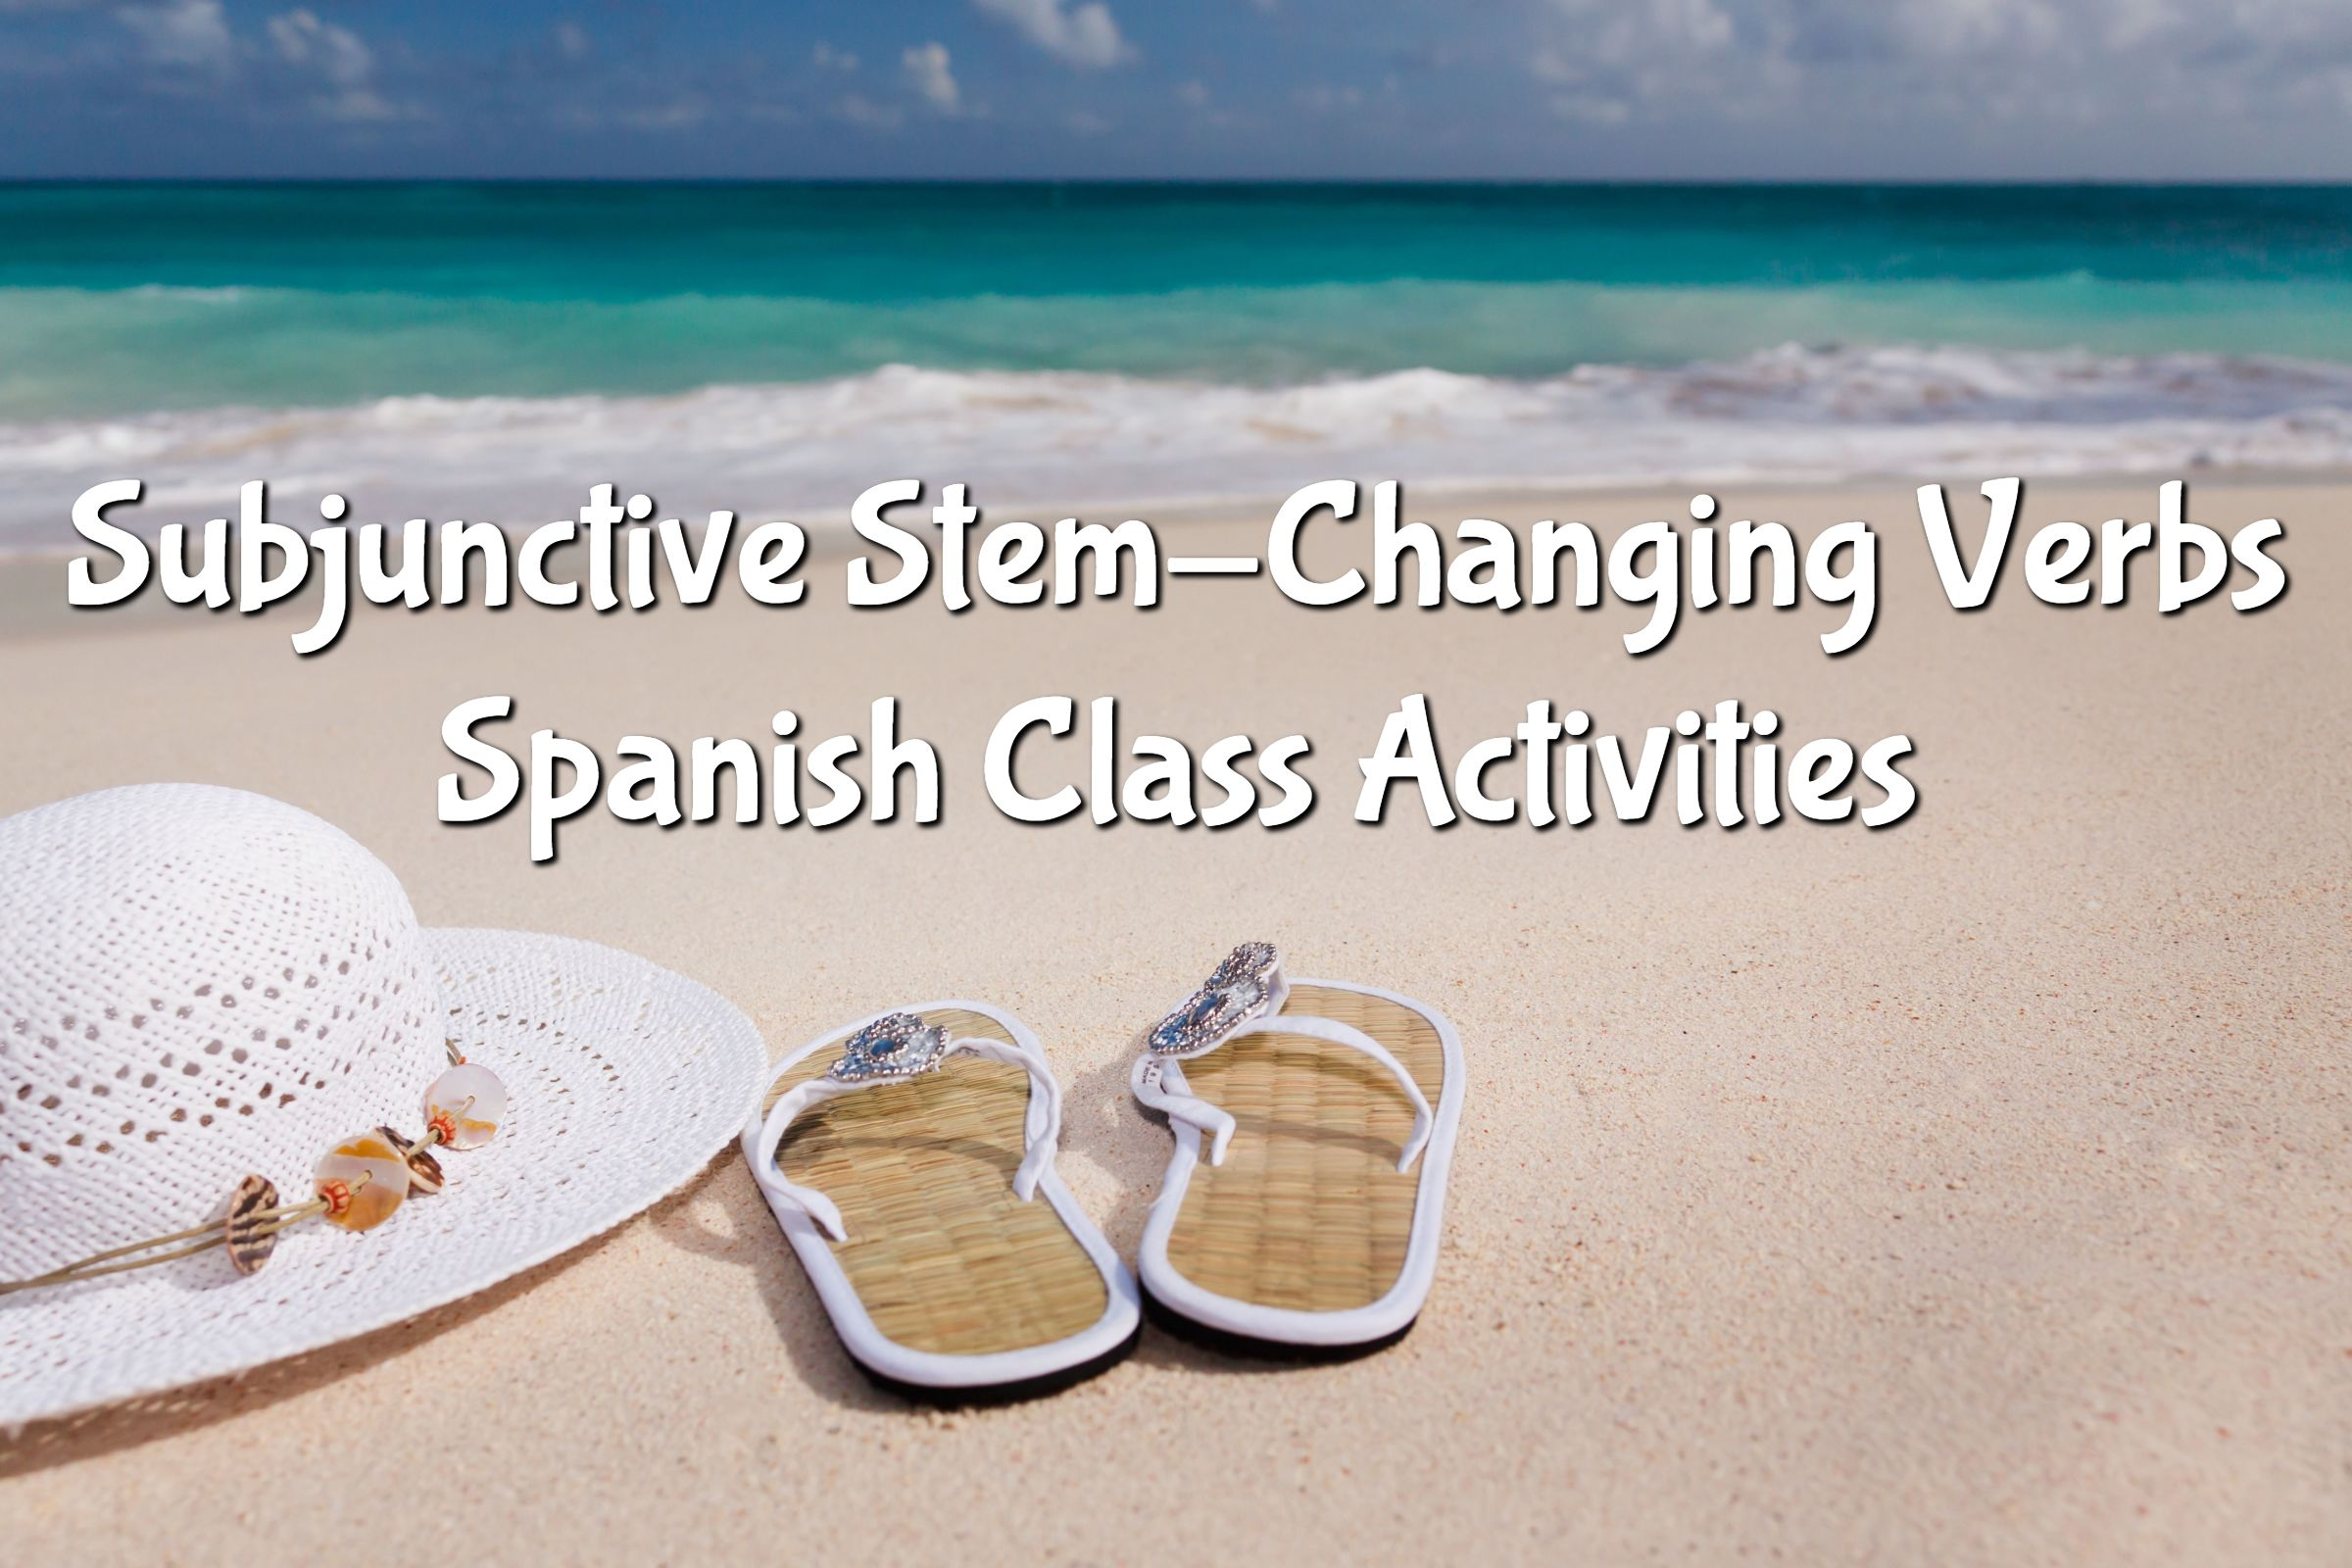 Subjunctive Stem Changing Verbs Spanish Class Activities Class Activities Spanish Learning Activities Spanish Exercises [ 1600 x 2400 Pixel ]